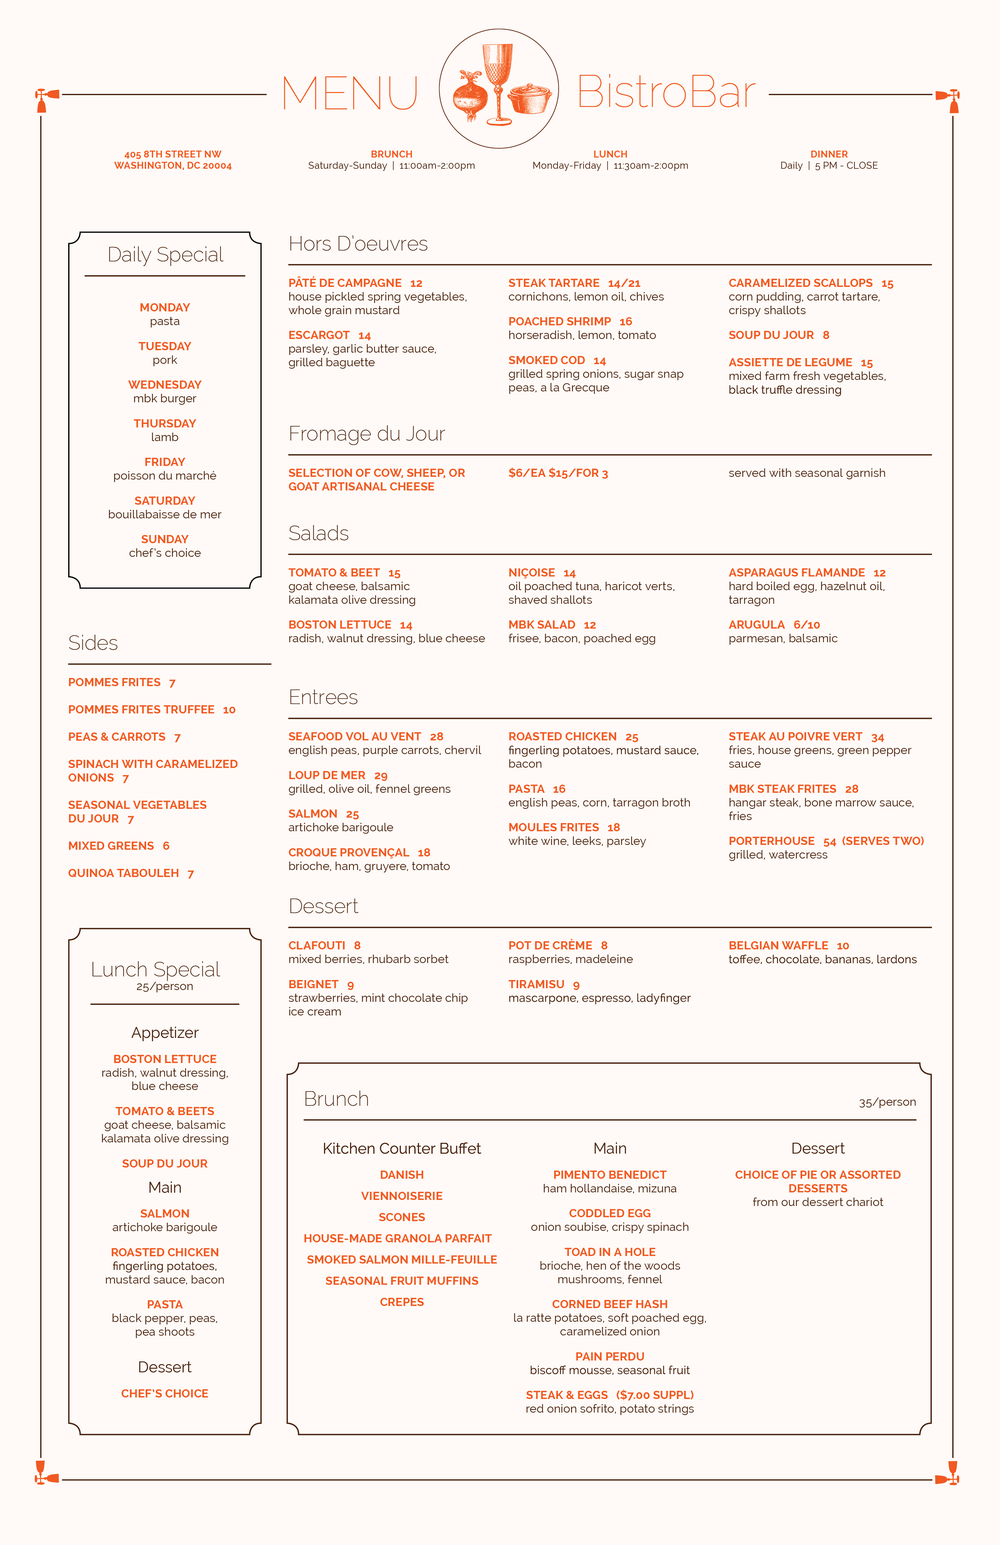 menu-mbk-menu